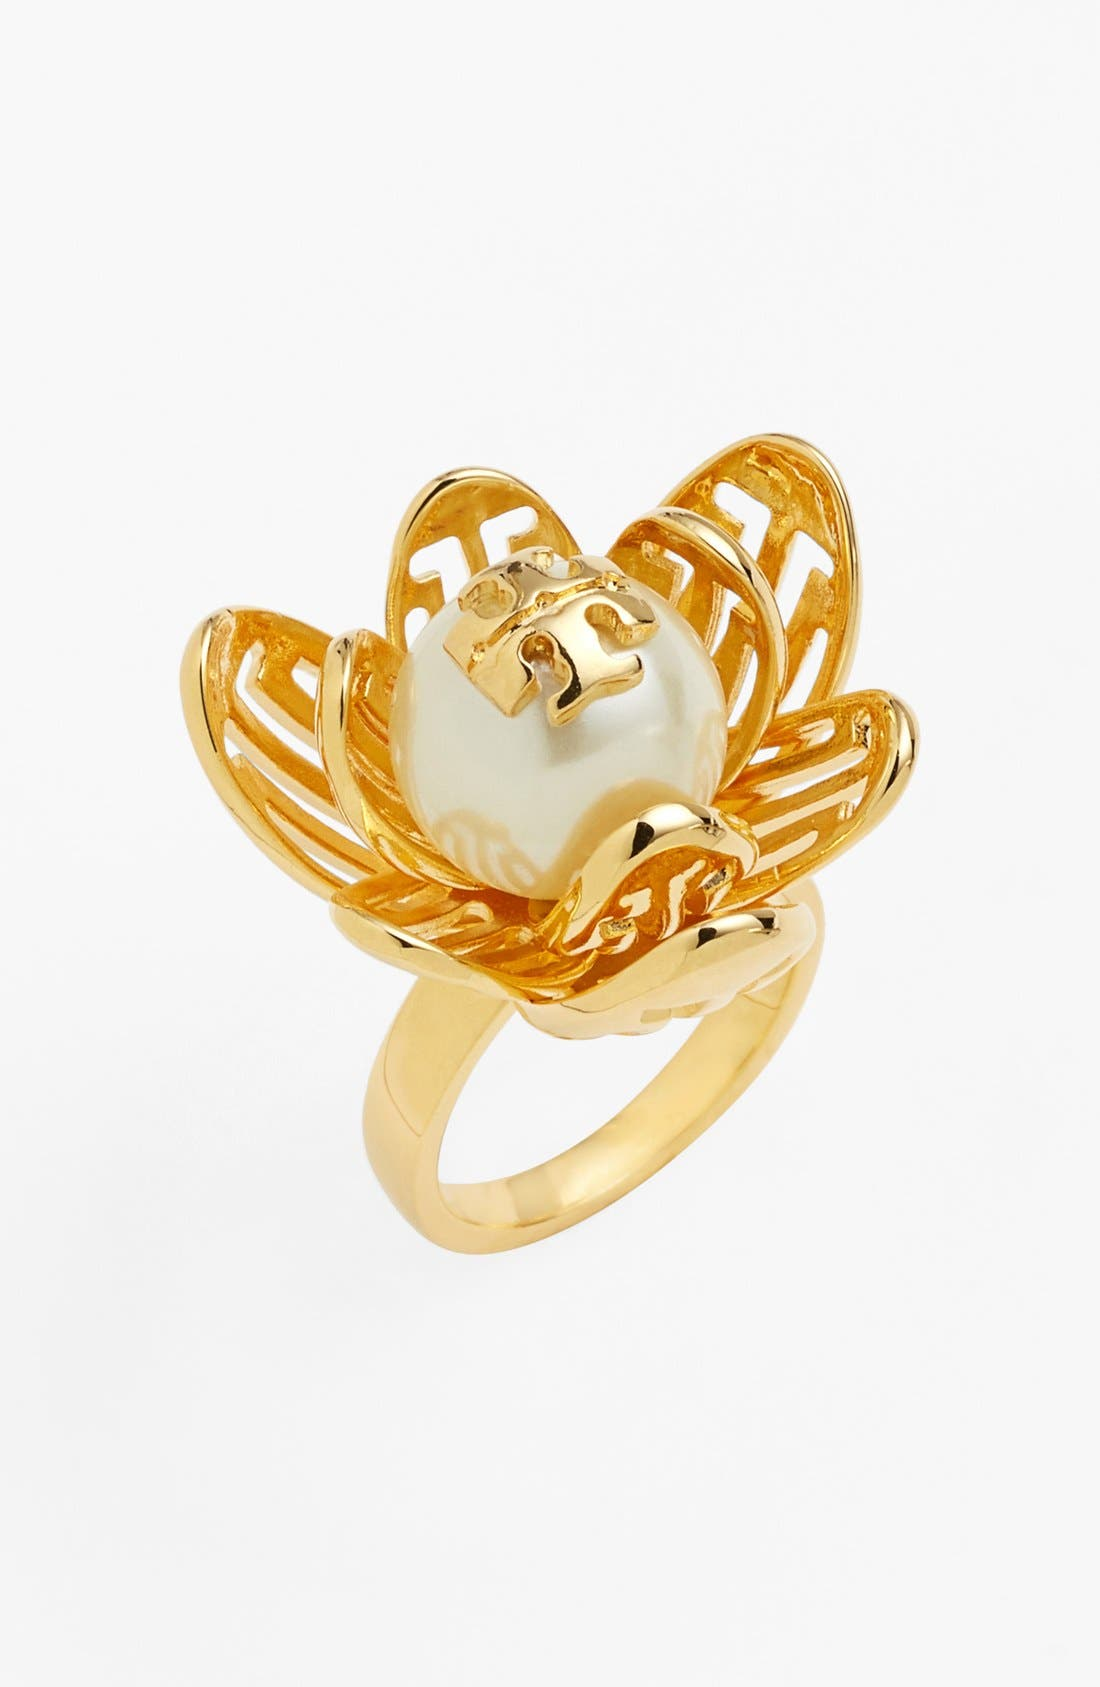 Alternate Image 1 Selected - Tory Burch 'Caras' Logo Faux Pearl Ring